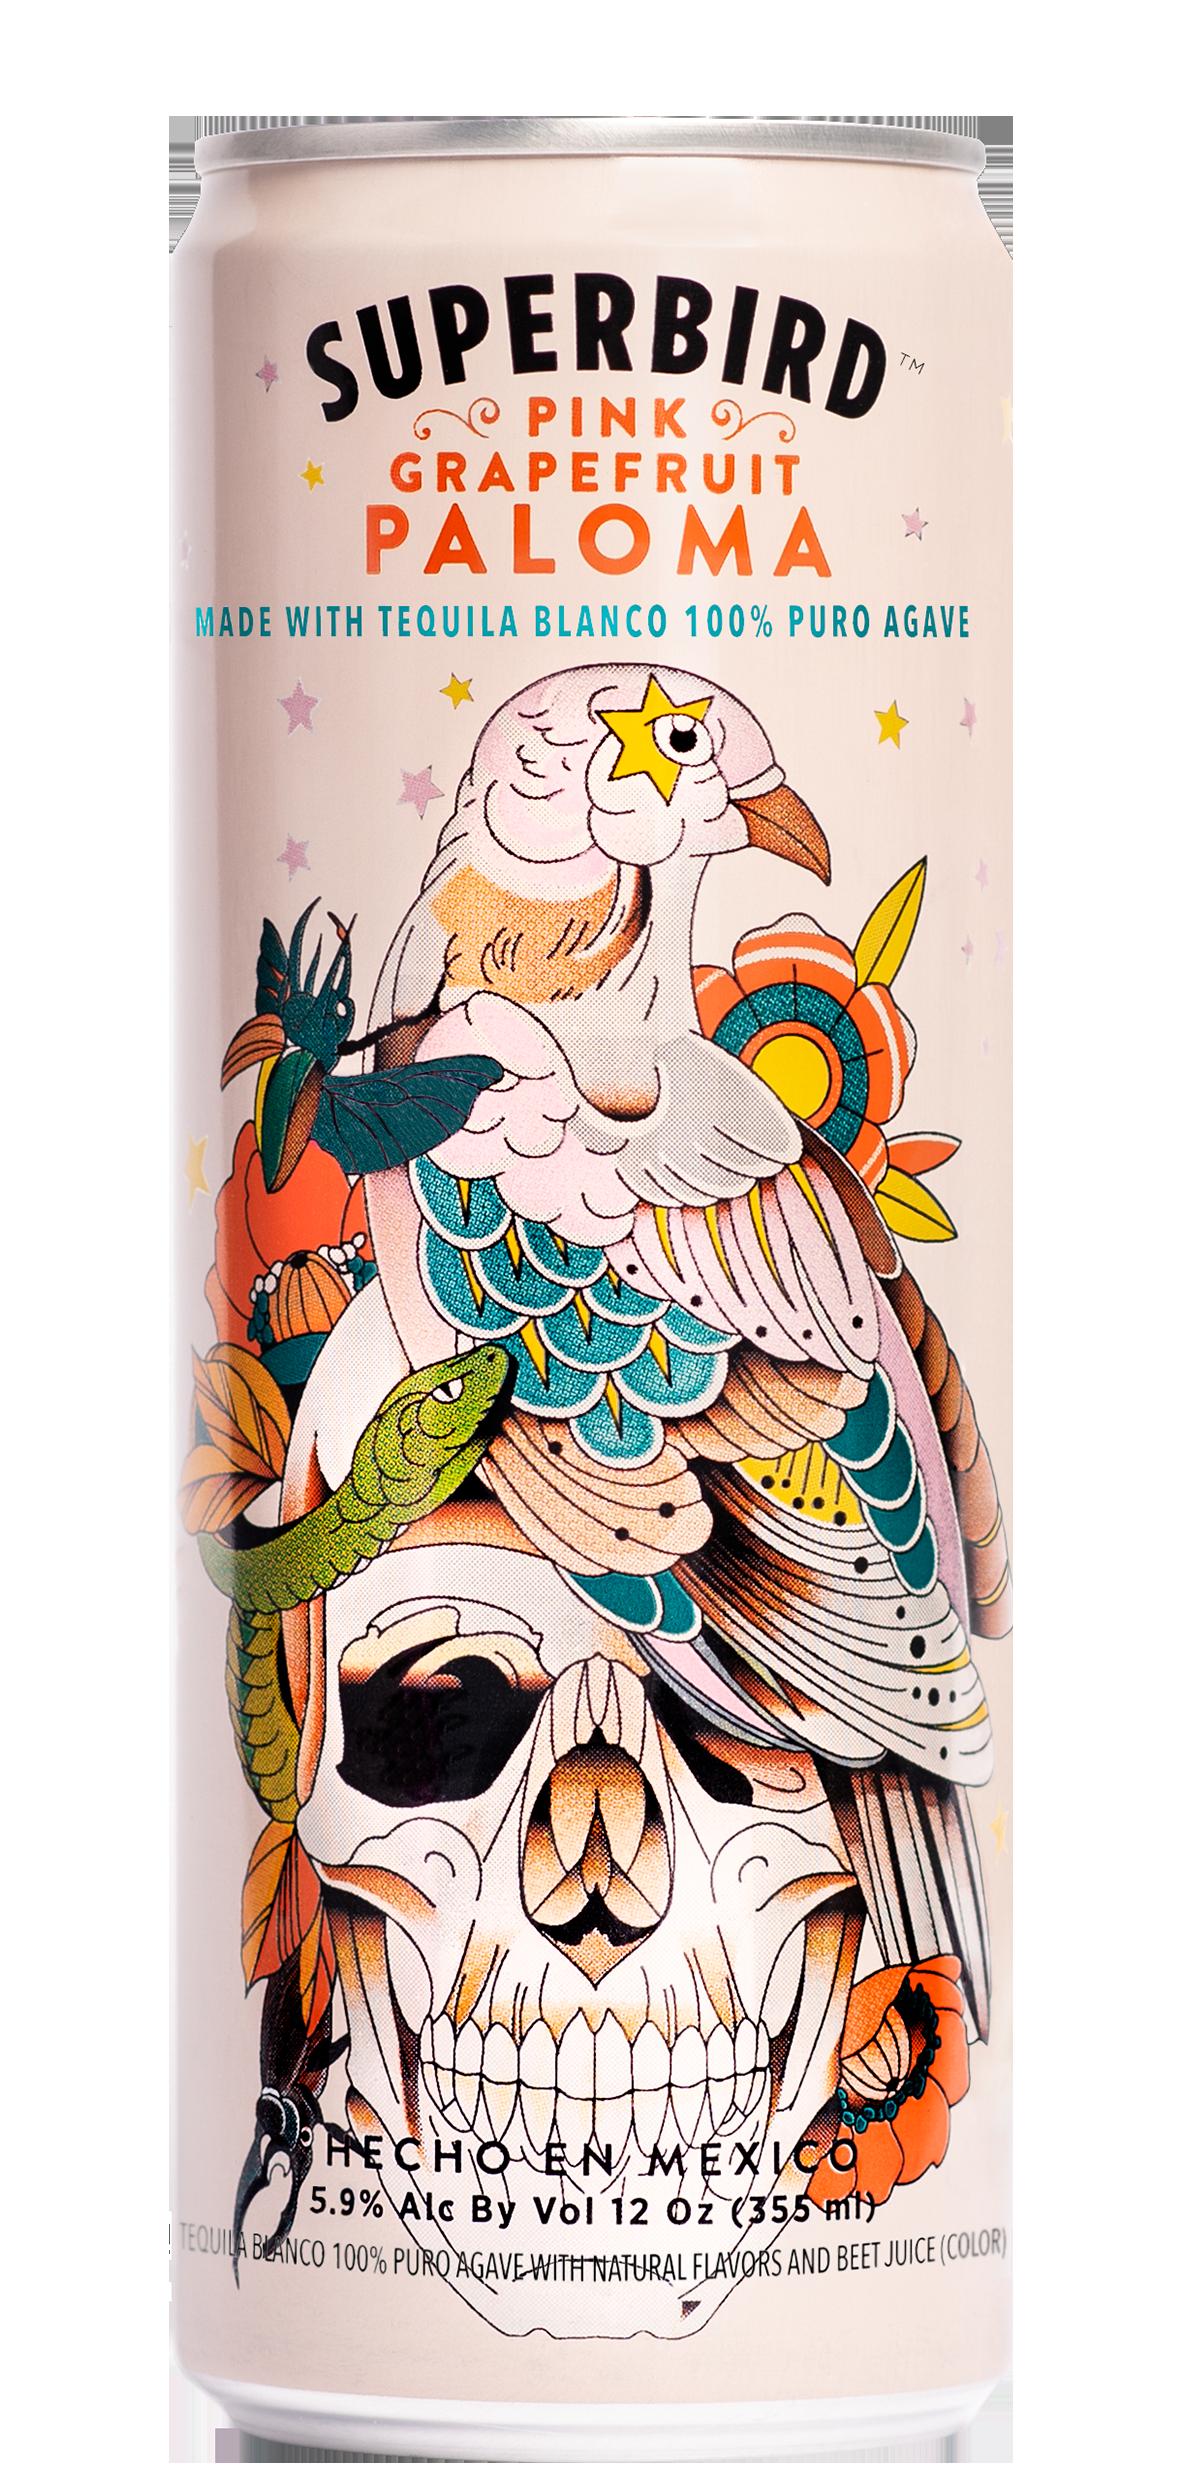 A can of Superbird Paloma